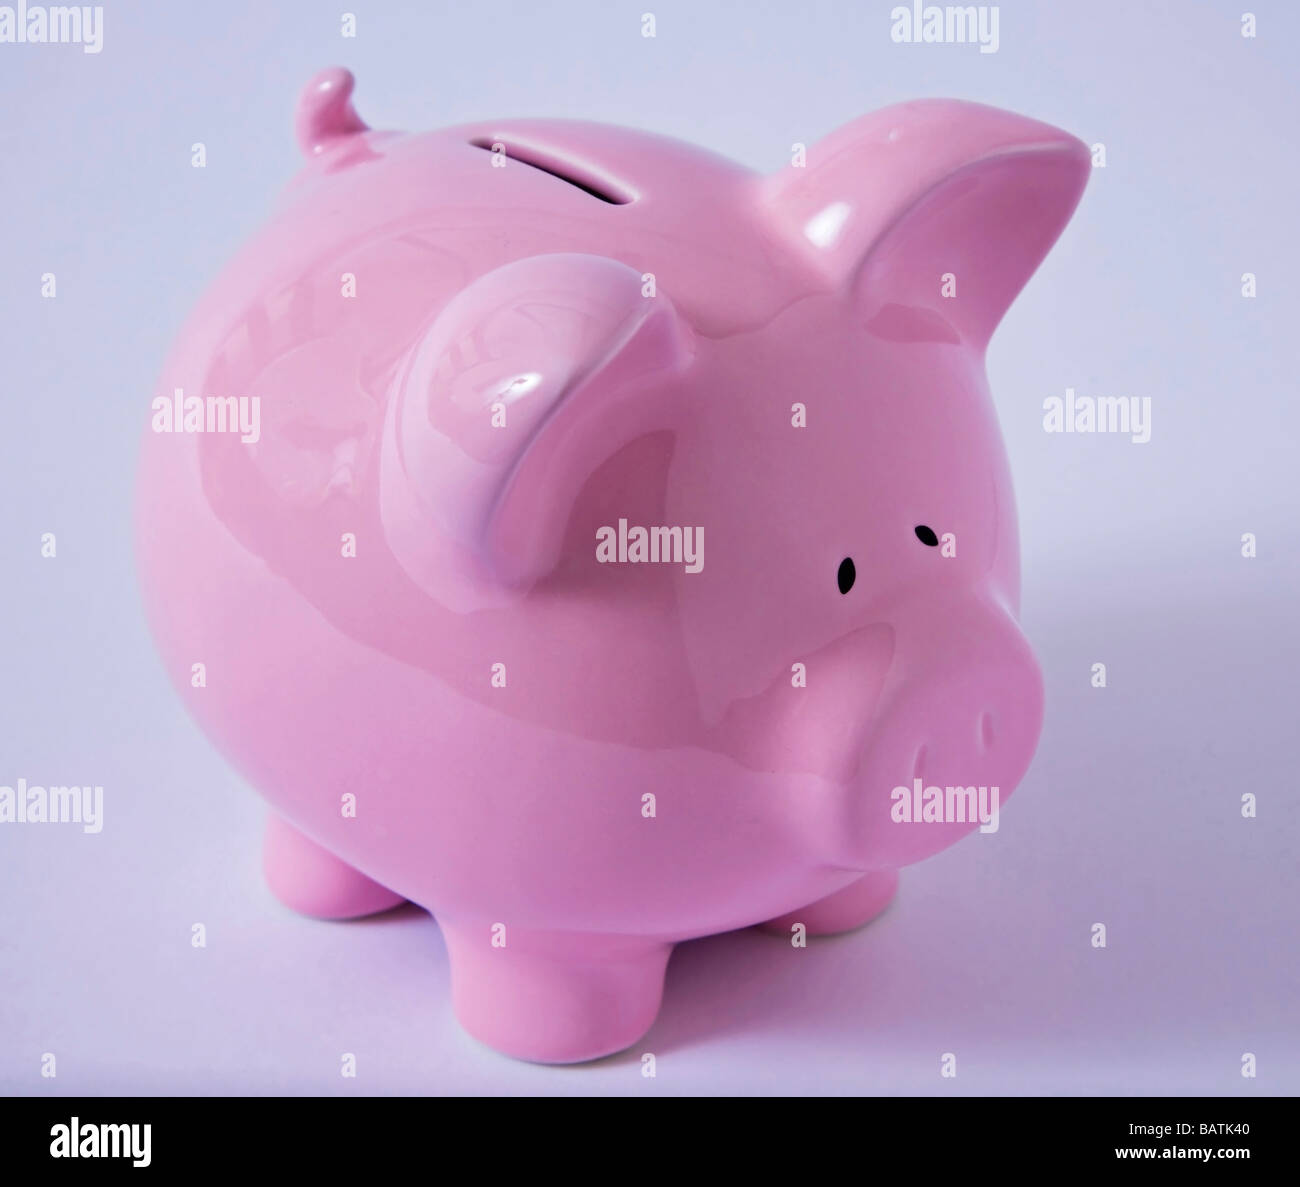 'piggy bank' 'money box' 'saving money' 'credit crunch' - Stock Image